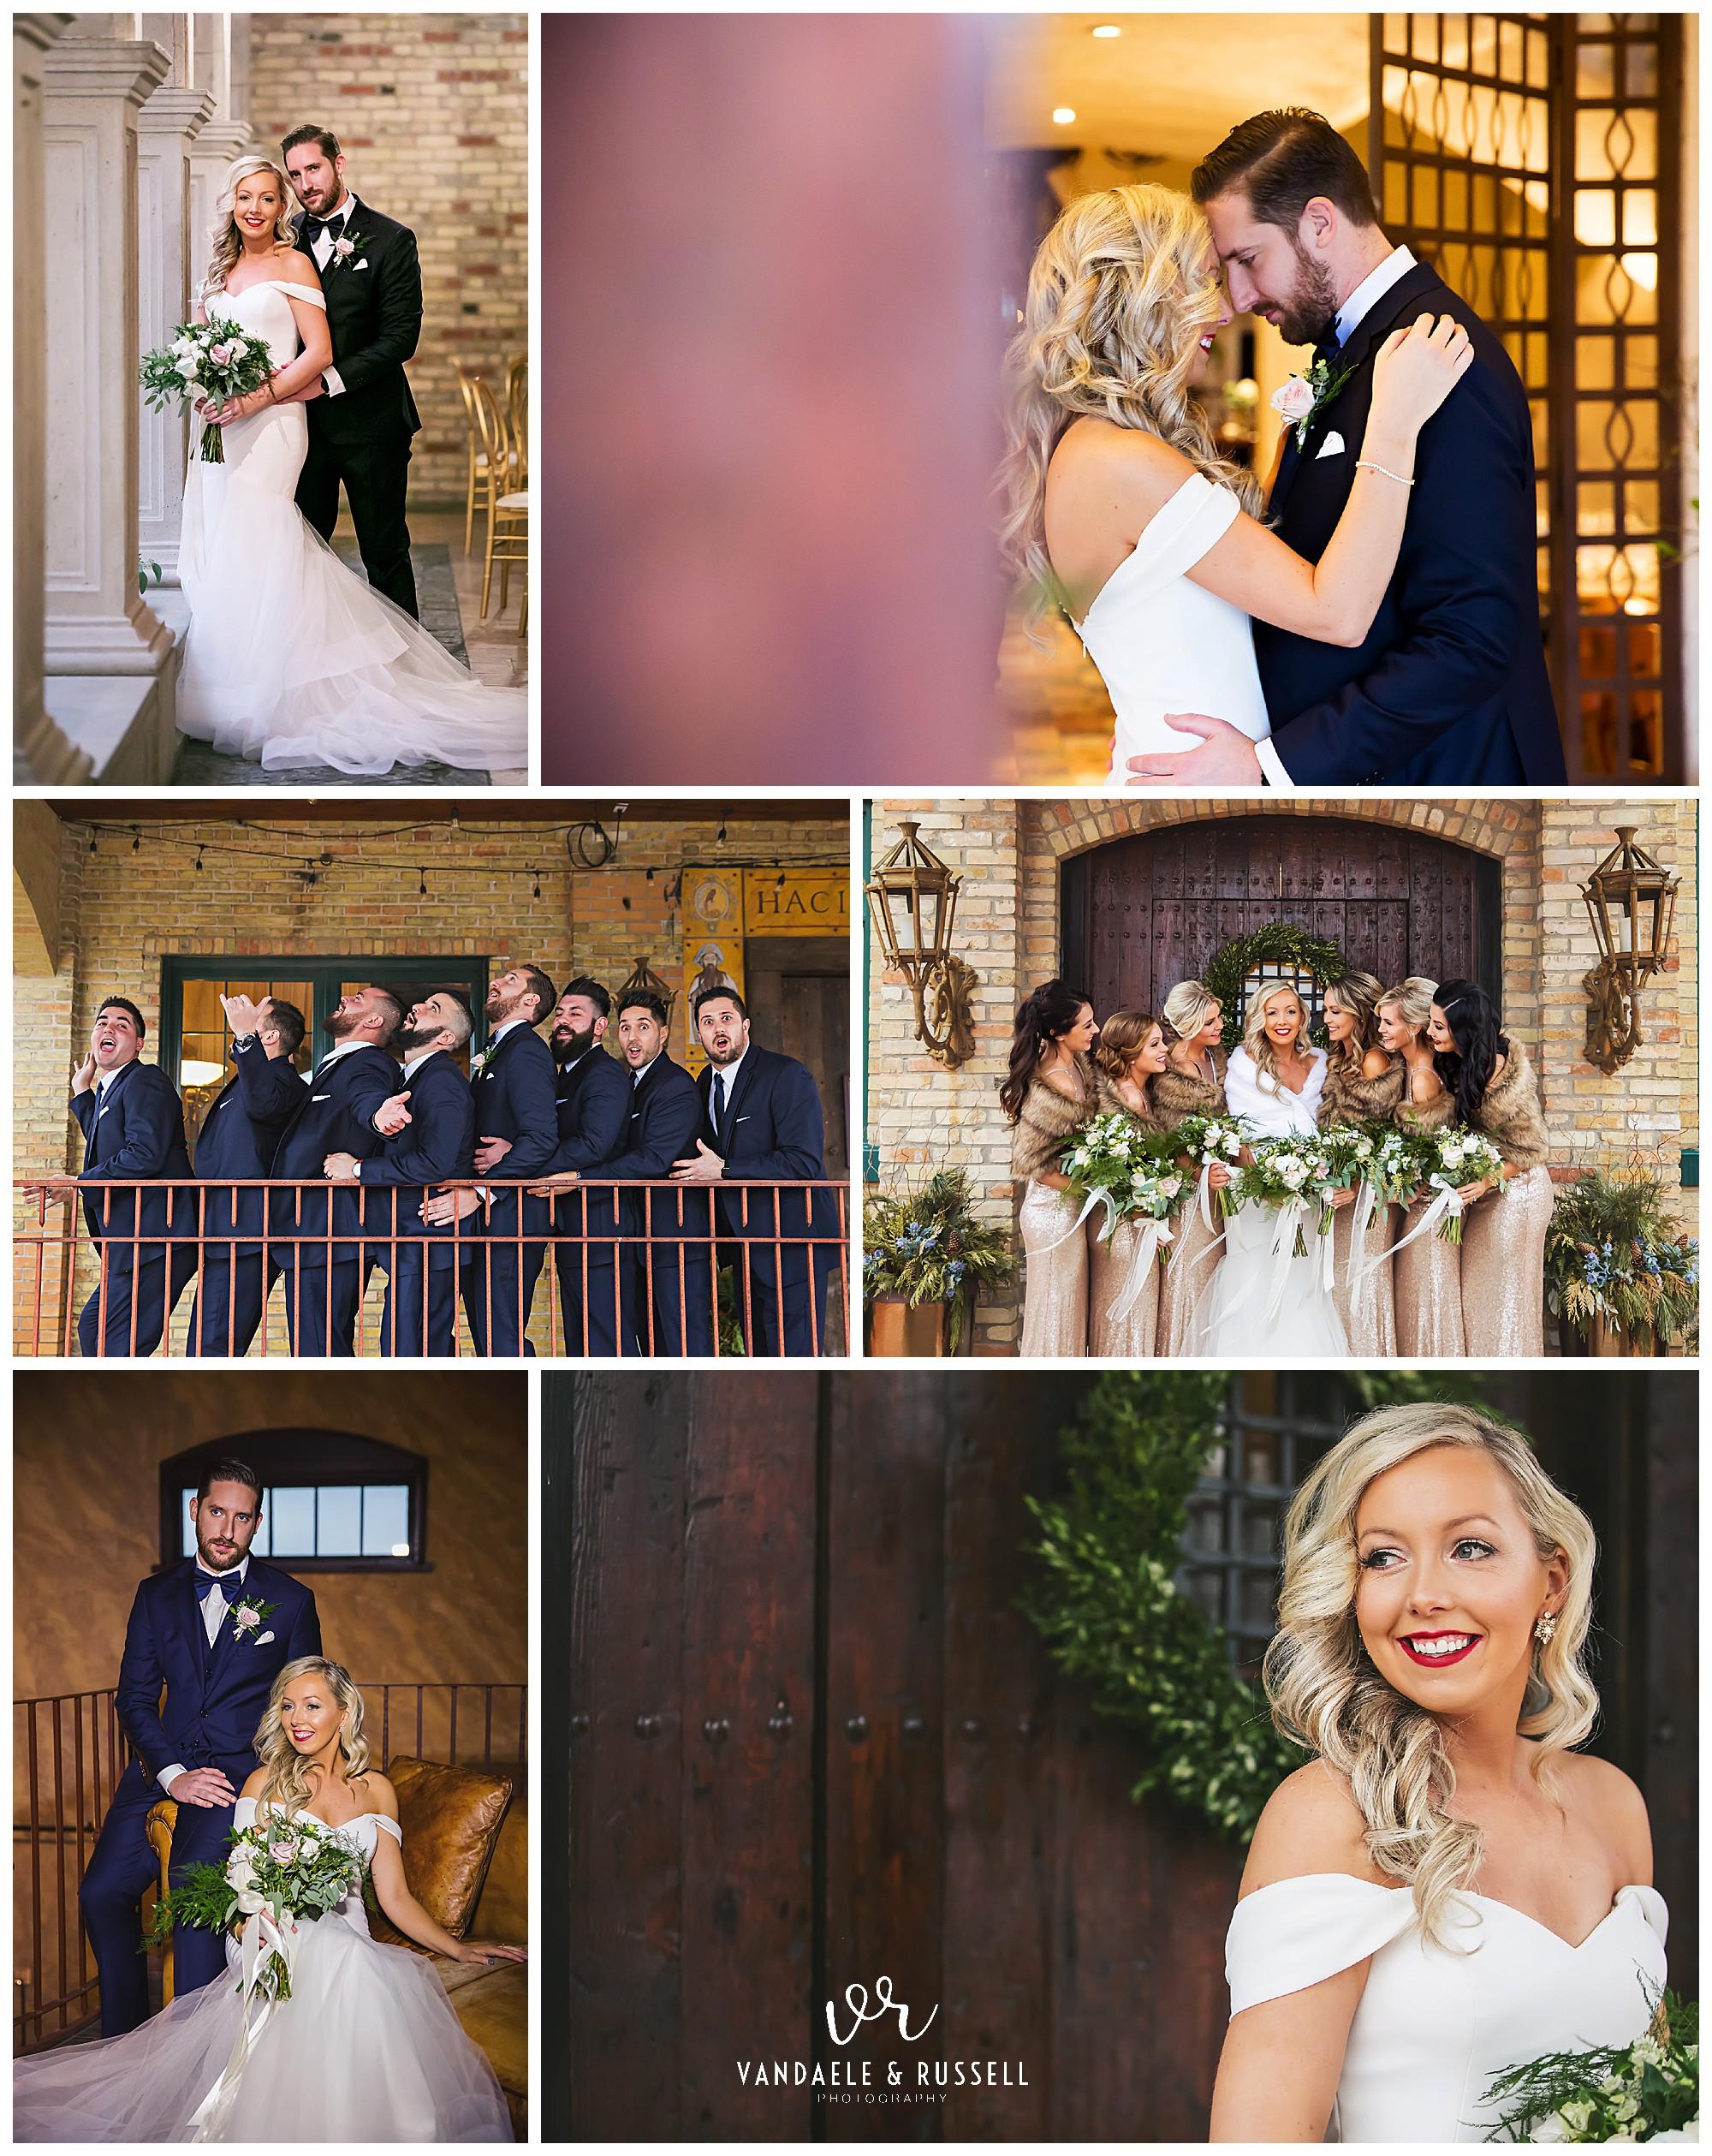 Hacienda-Sarria-Wedding-Photos-NYE-Michelle-Matt-VanDaele-Russell_0017.jpg